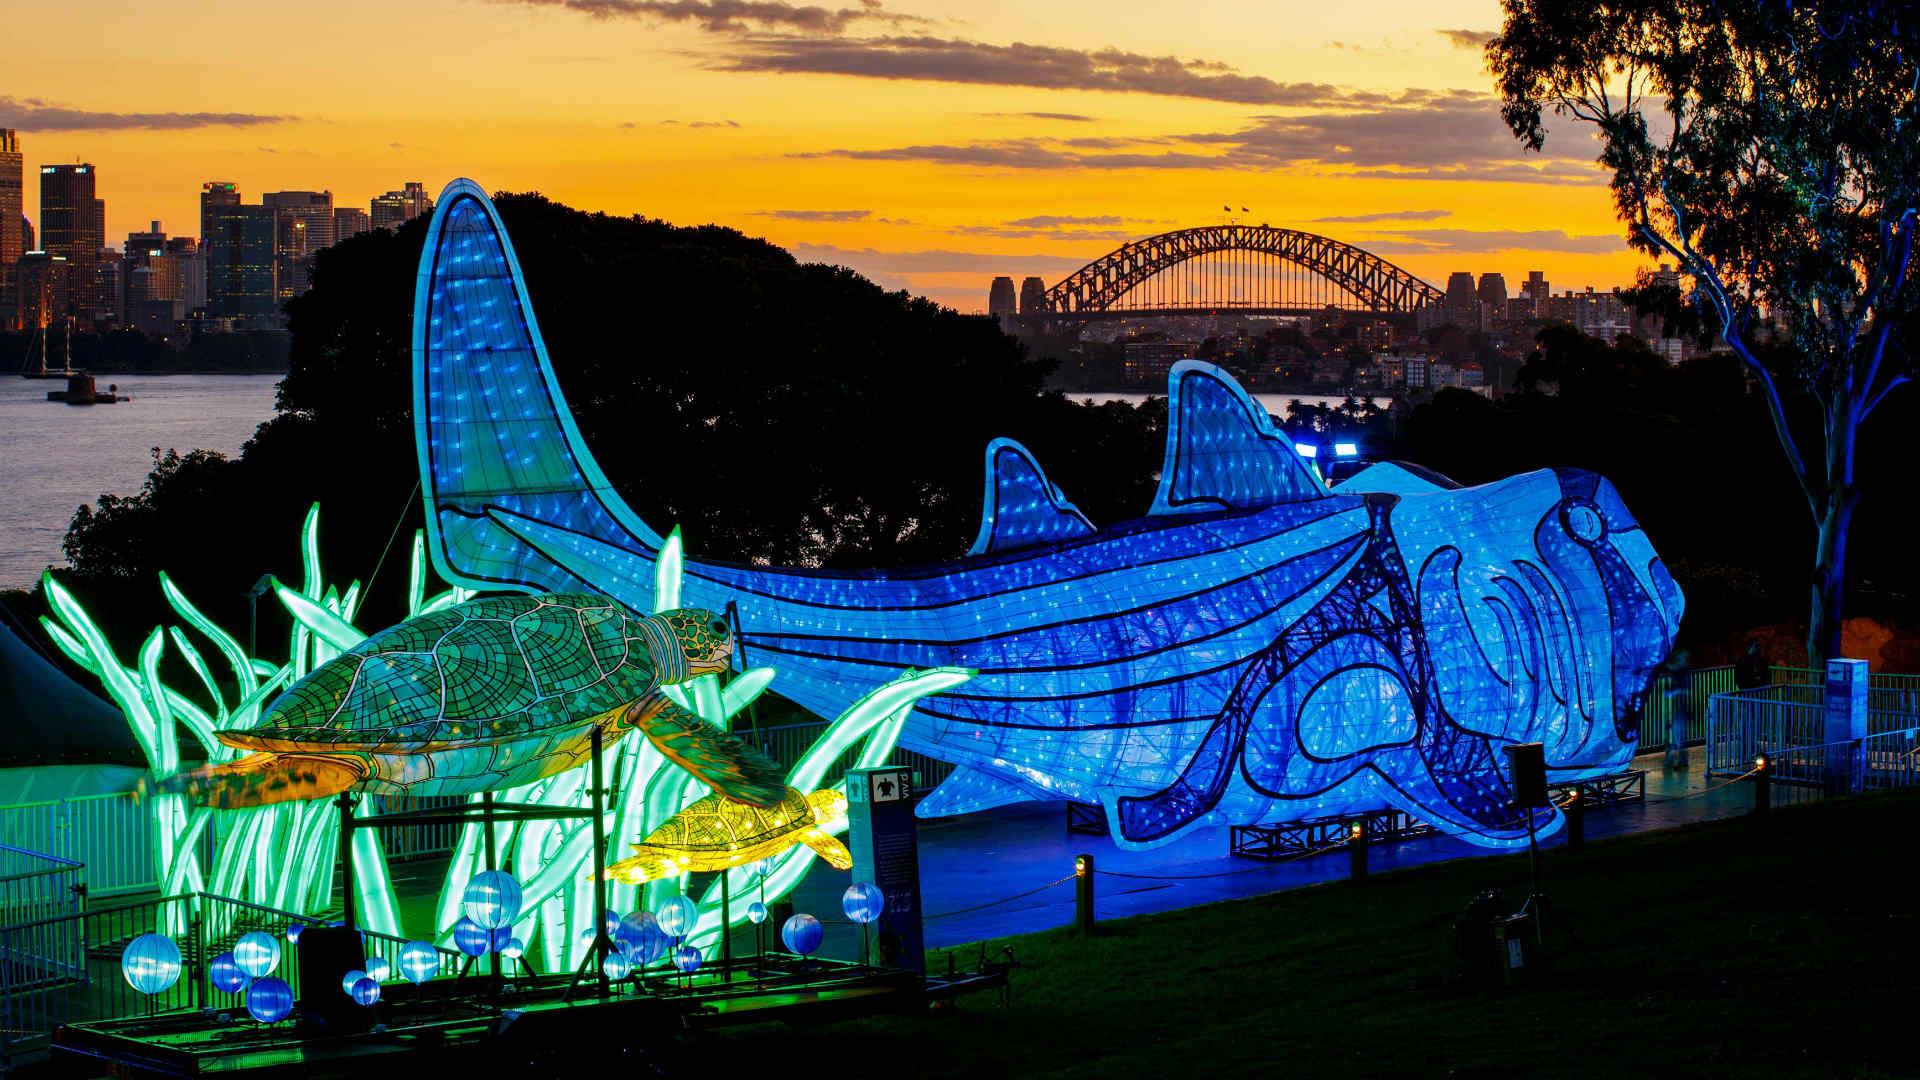 vivid-sydney-2017-taronga-zoo-port-jackson-shark-destination-NSW-james-horan.jpg